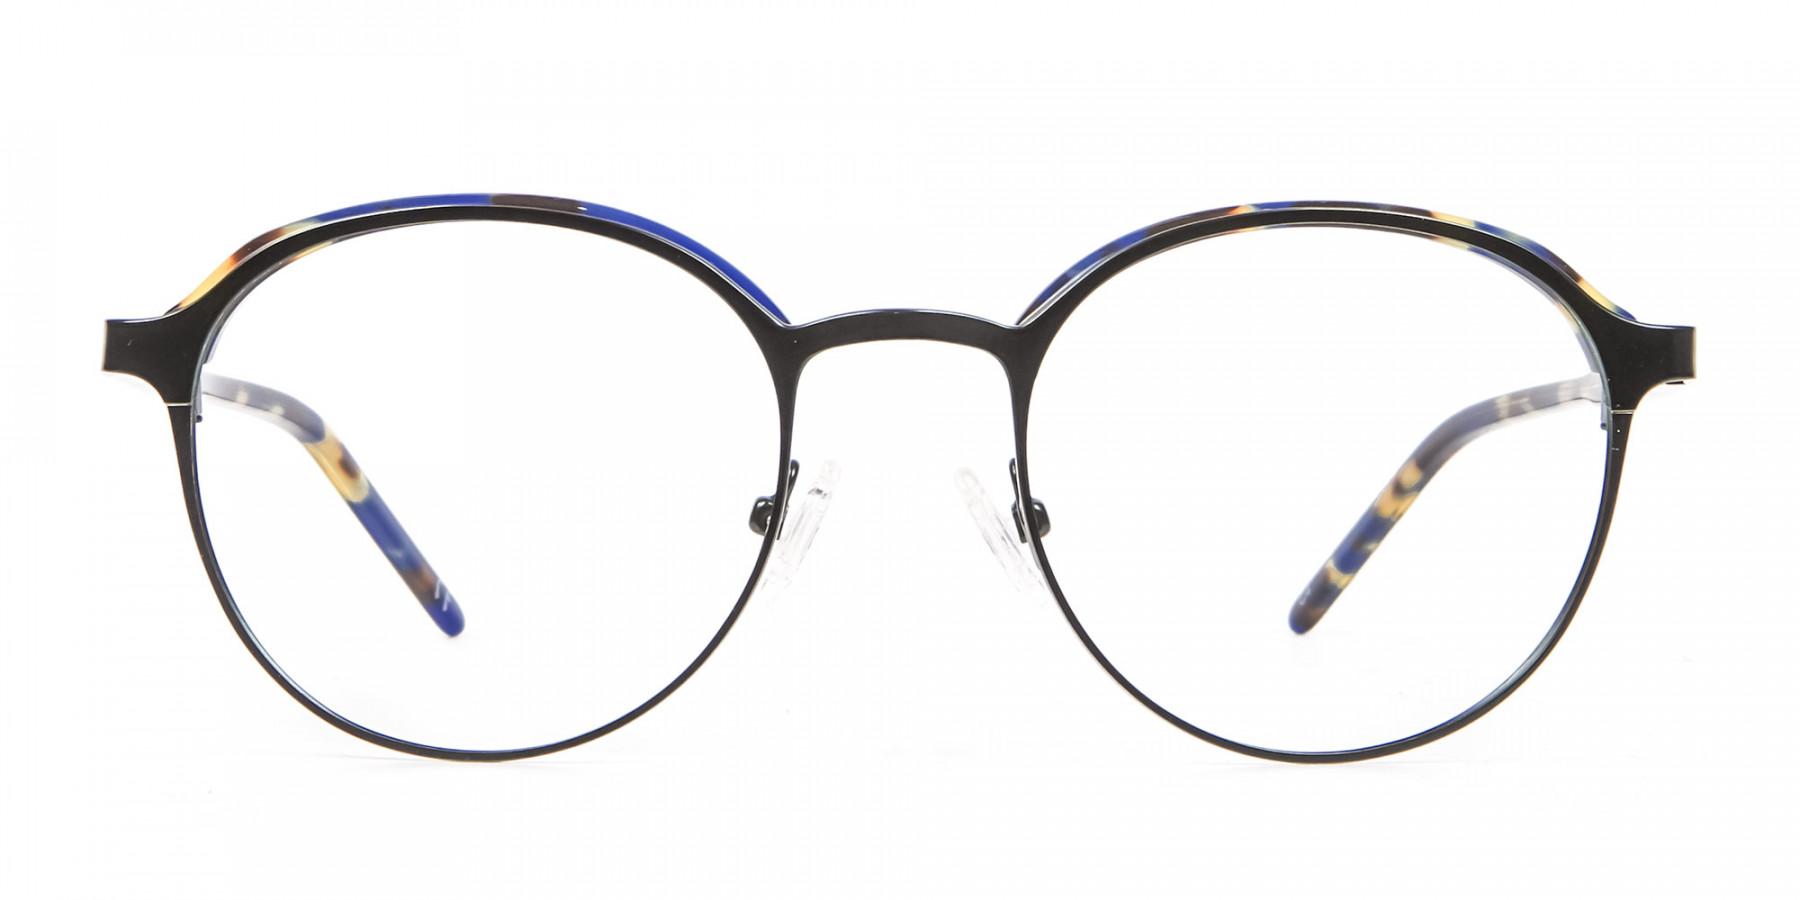 Green and Tortoiseshell Round Glasses